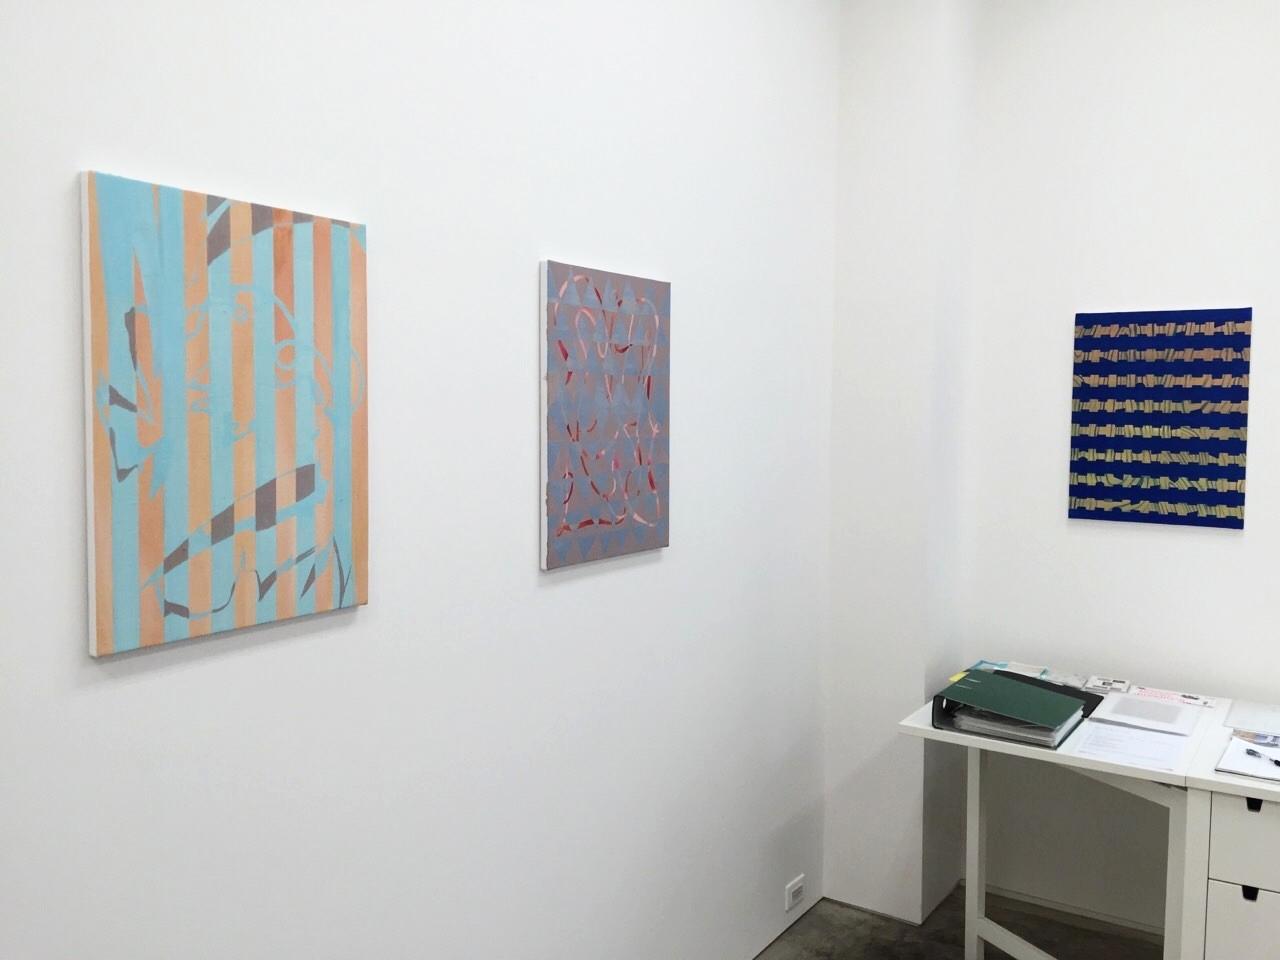 Winter Show , Koki Arts, Tokyo, Japan 12/2014